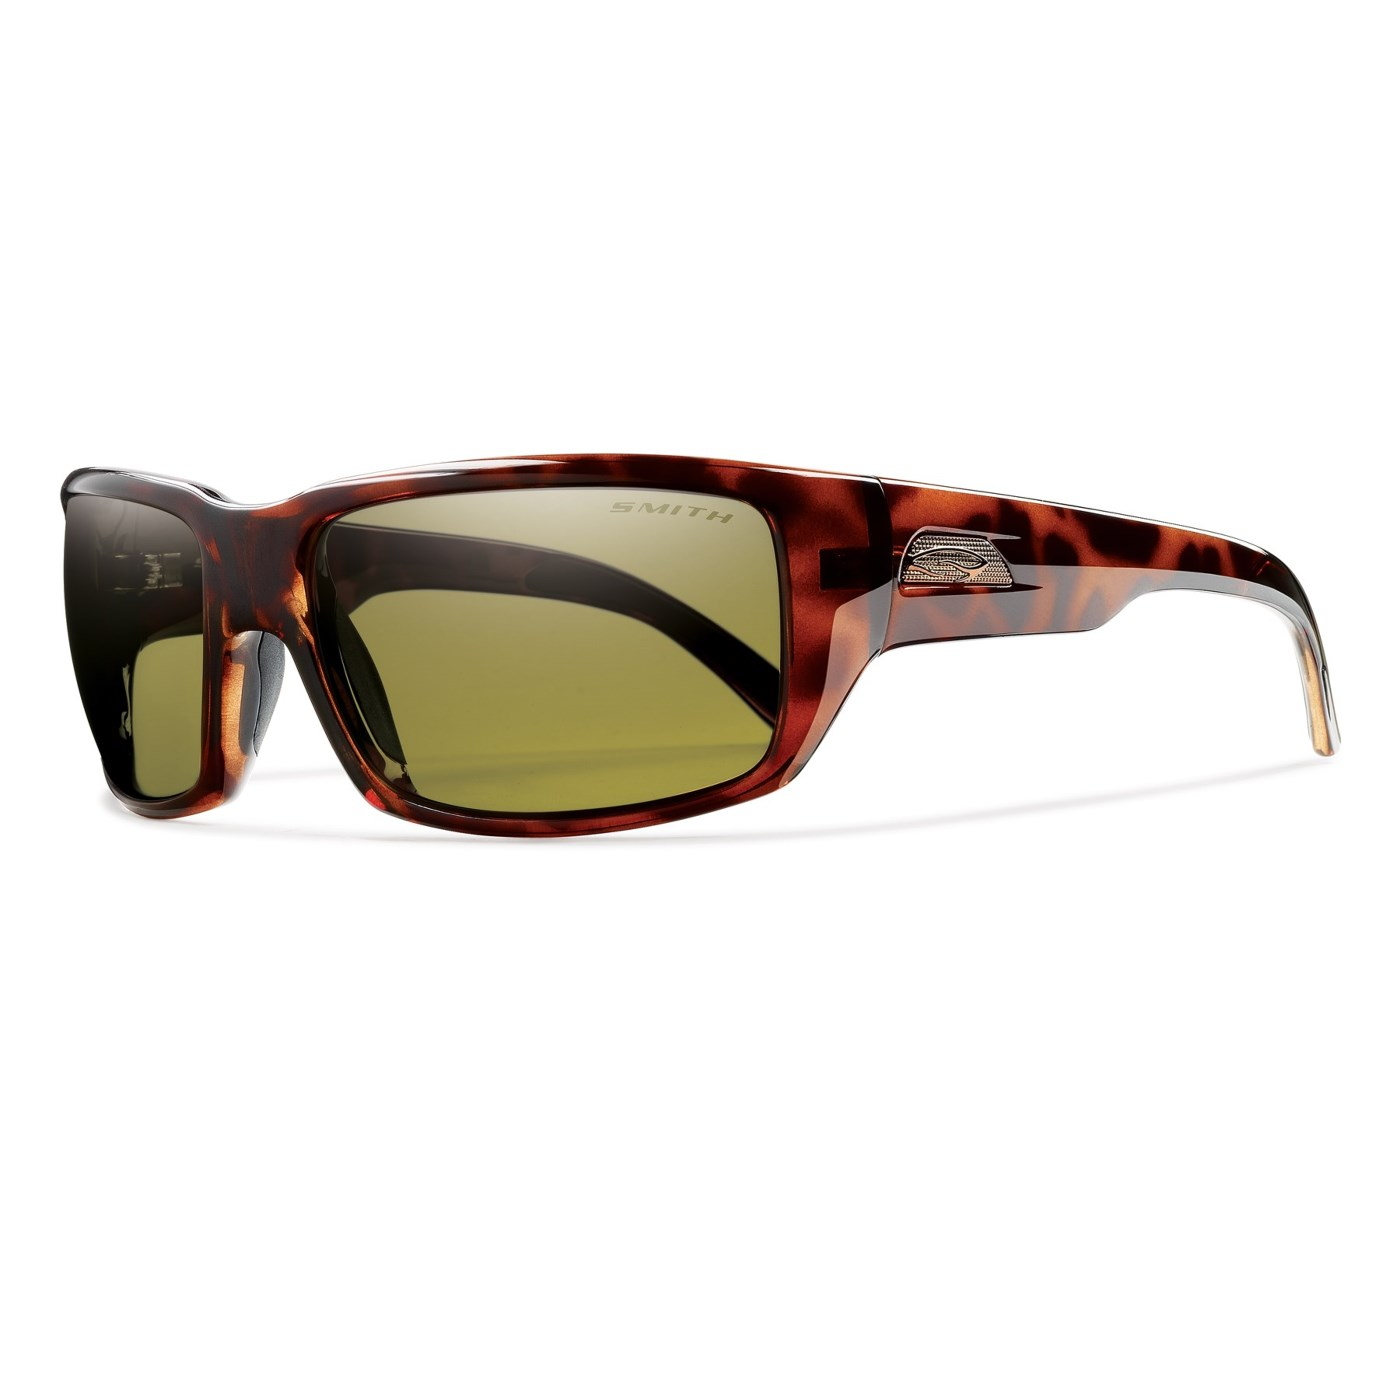 a5b1f56a58 Smith Optics Touchstone Sunglasses Polarchromic Glass Lenses 9835W ...